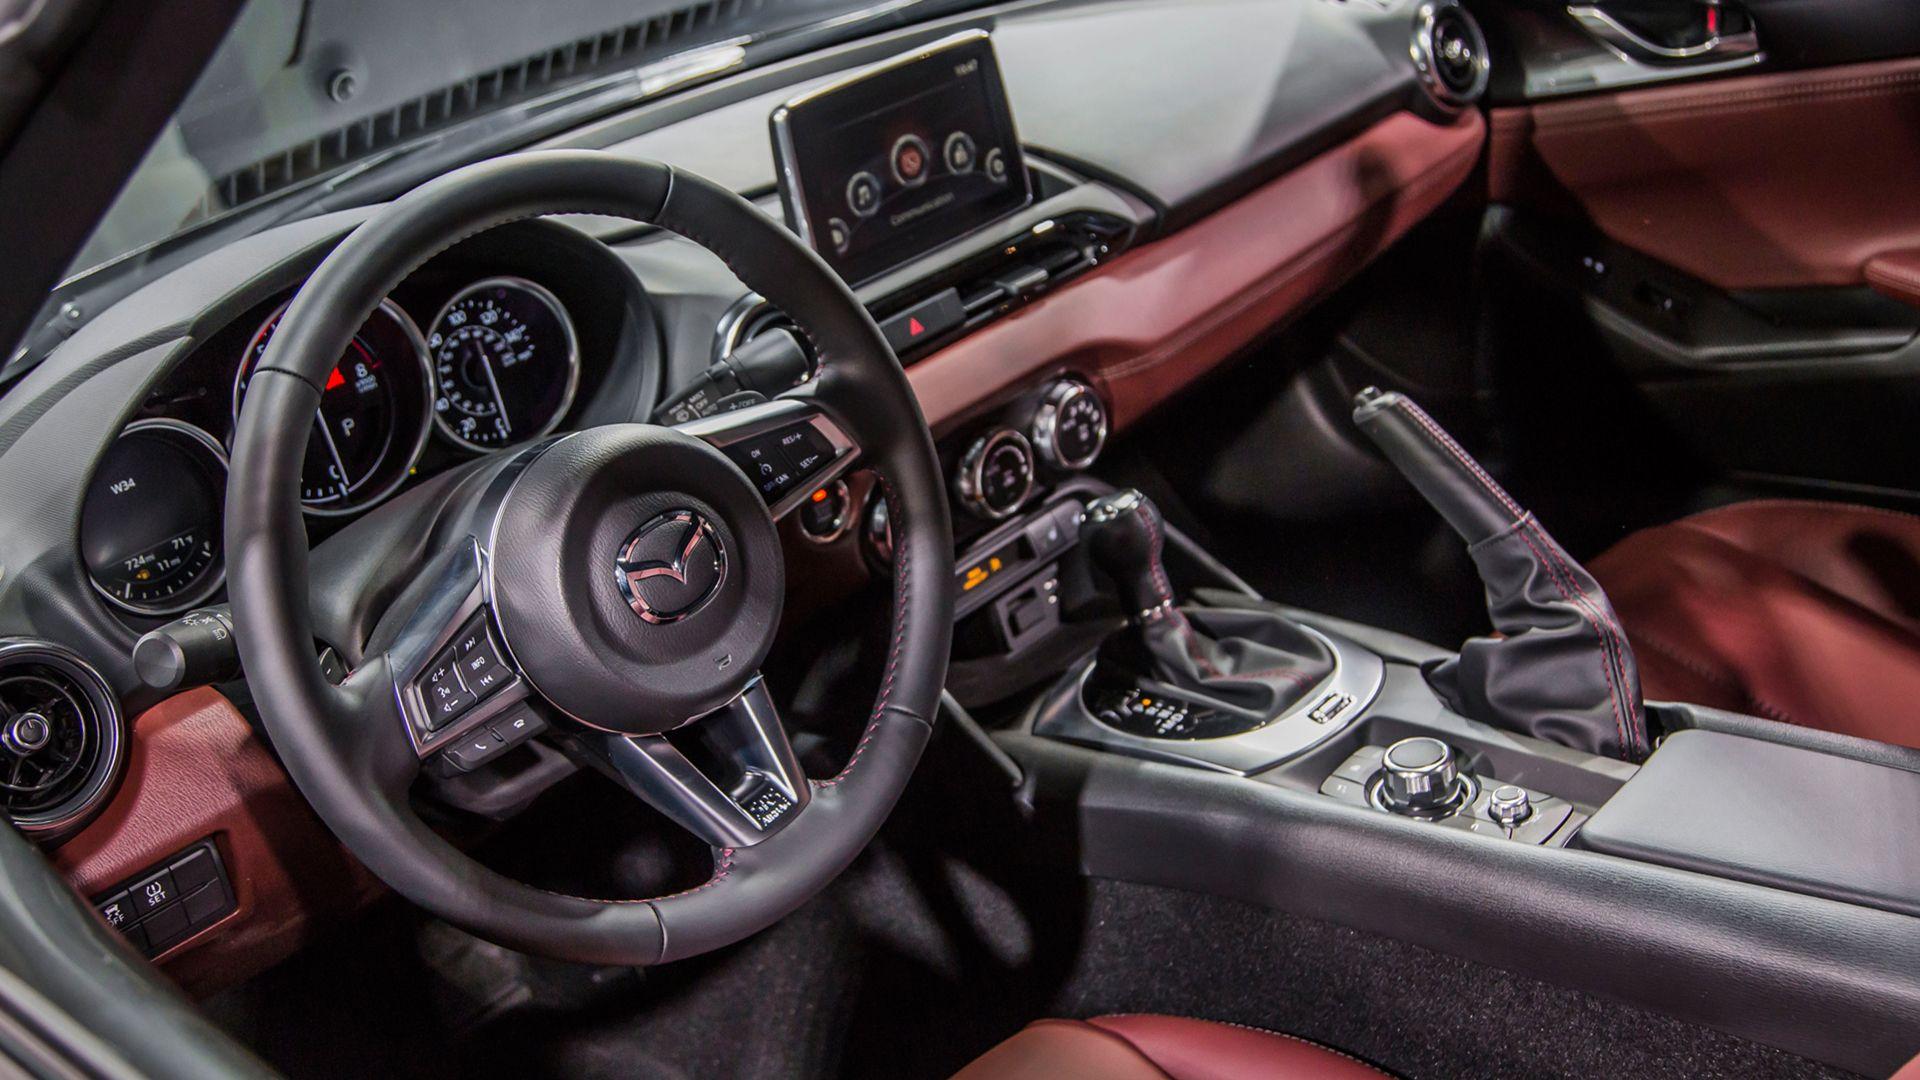 2019 Mazda Mx 5 Interior Design Carros